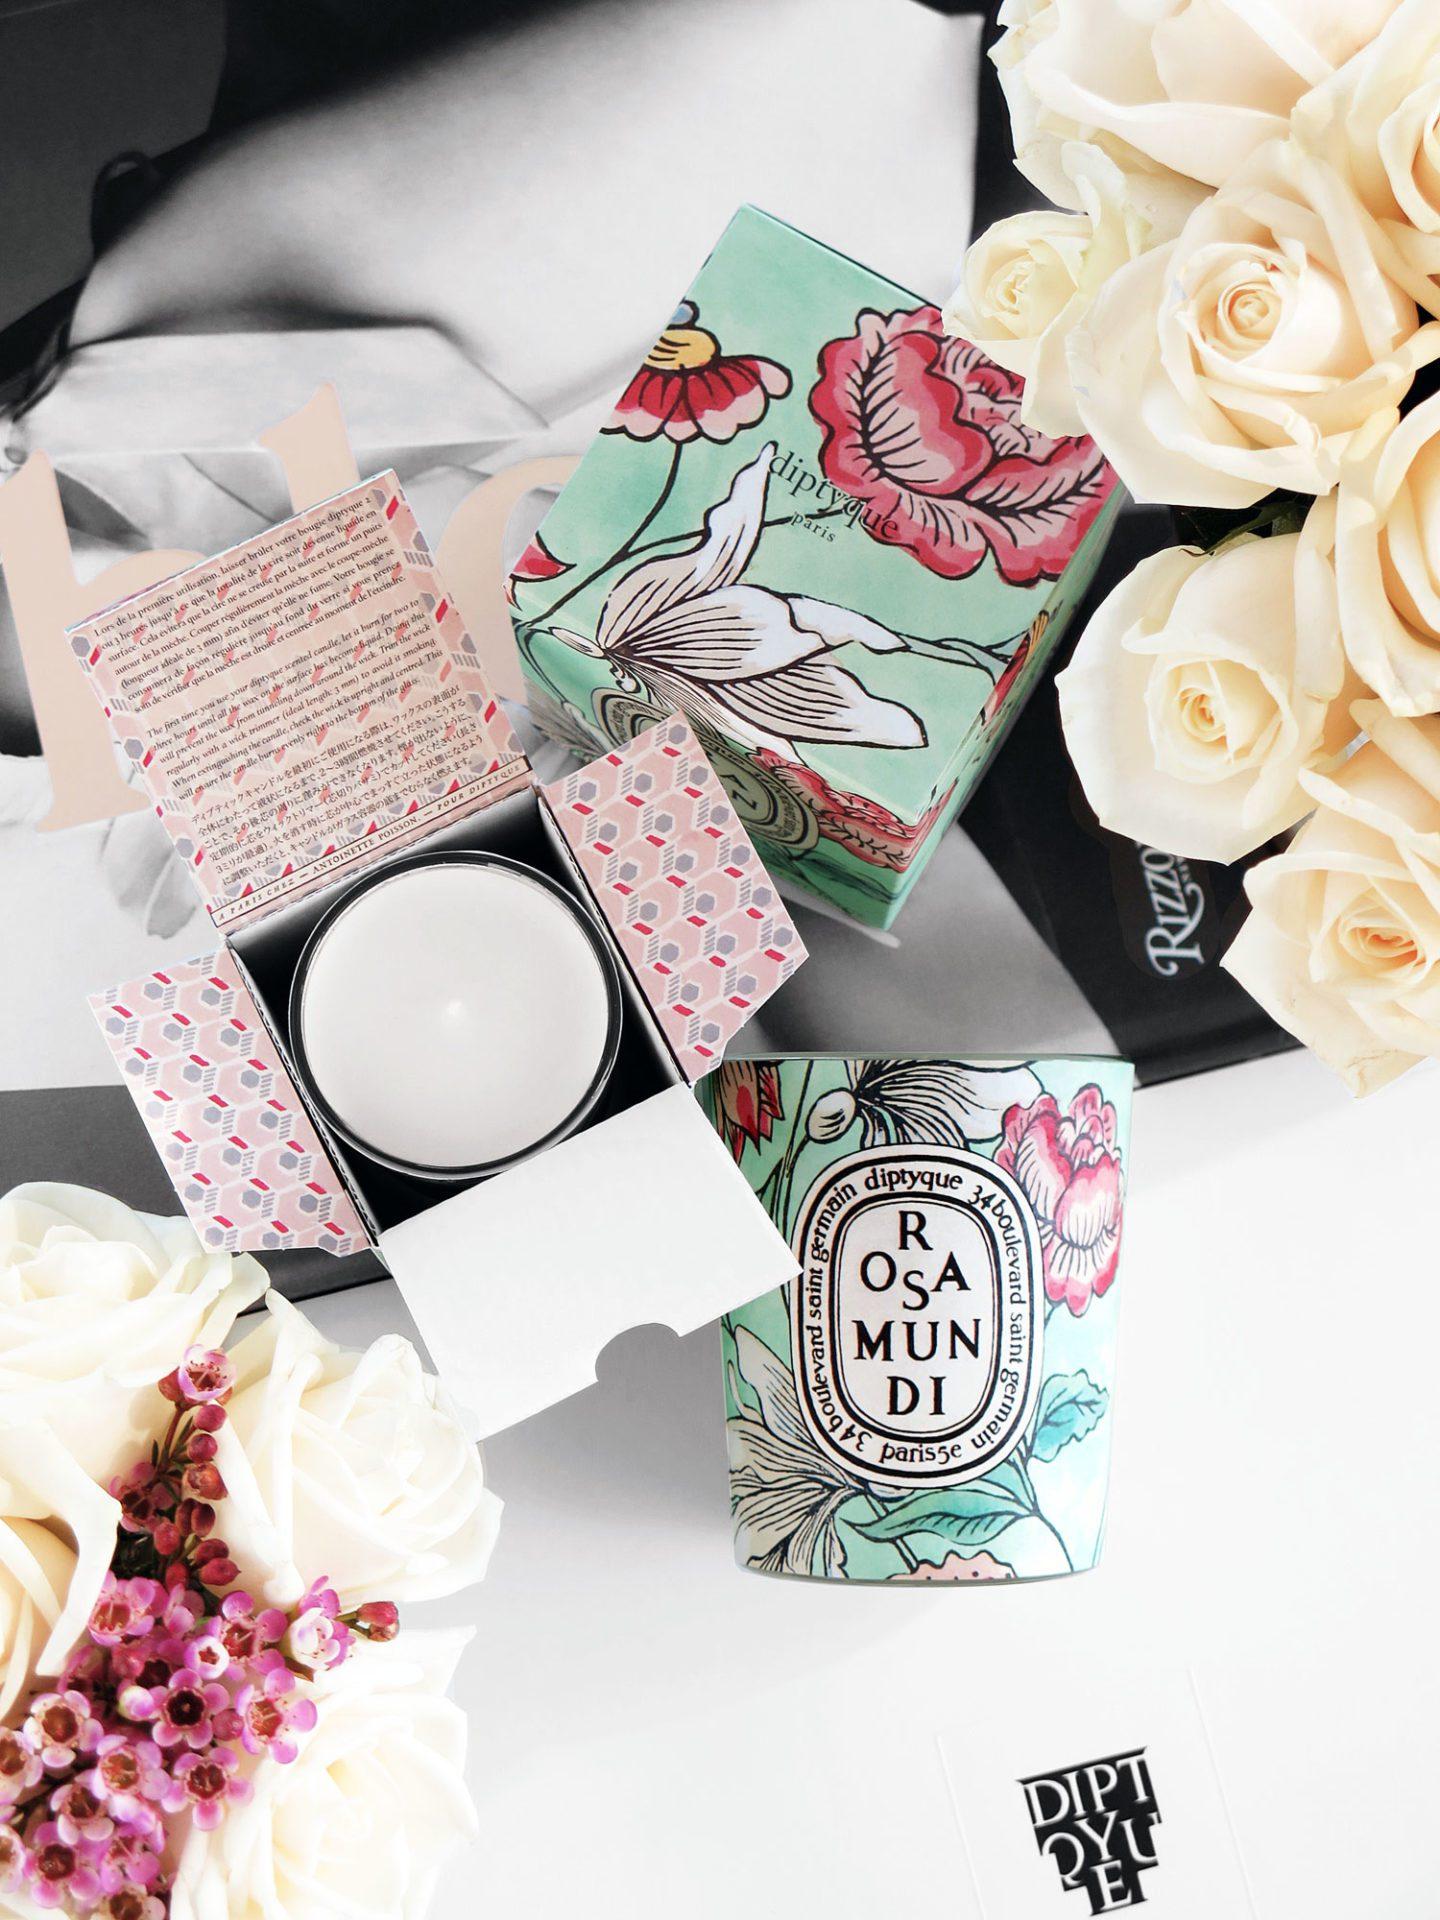 Diptyque Rosa Mundi | The Beauty Look Book